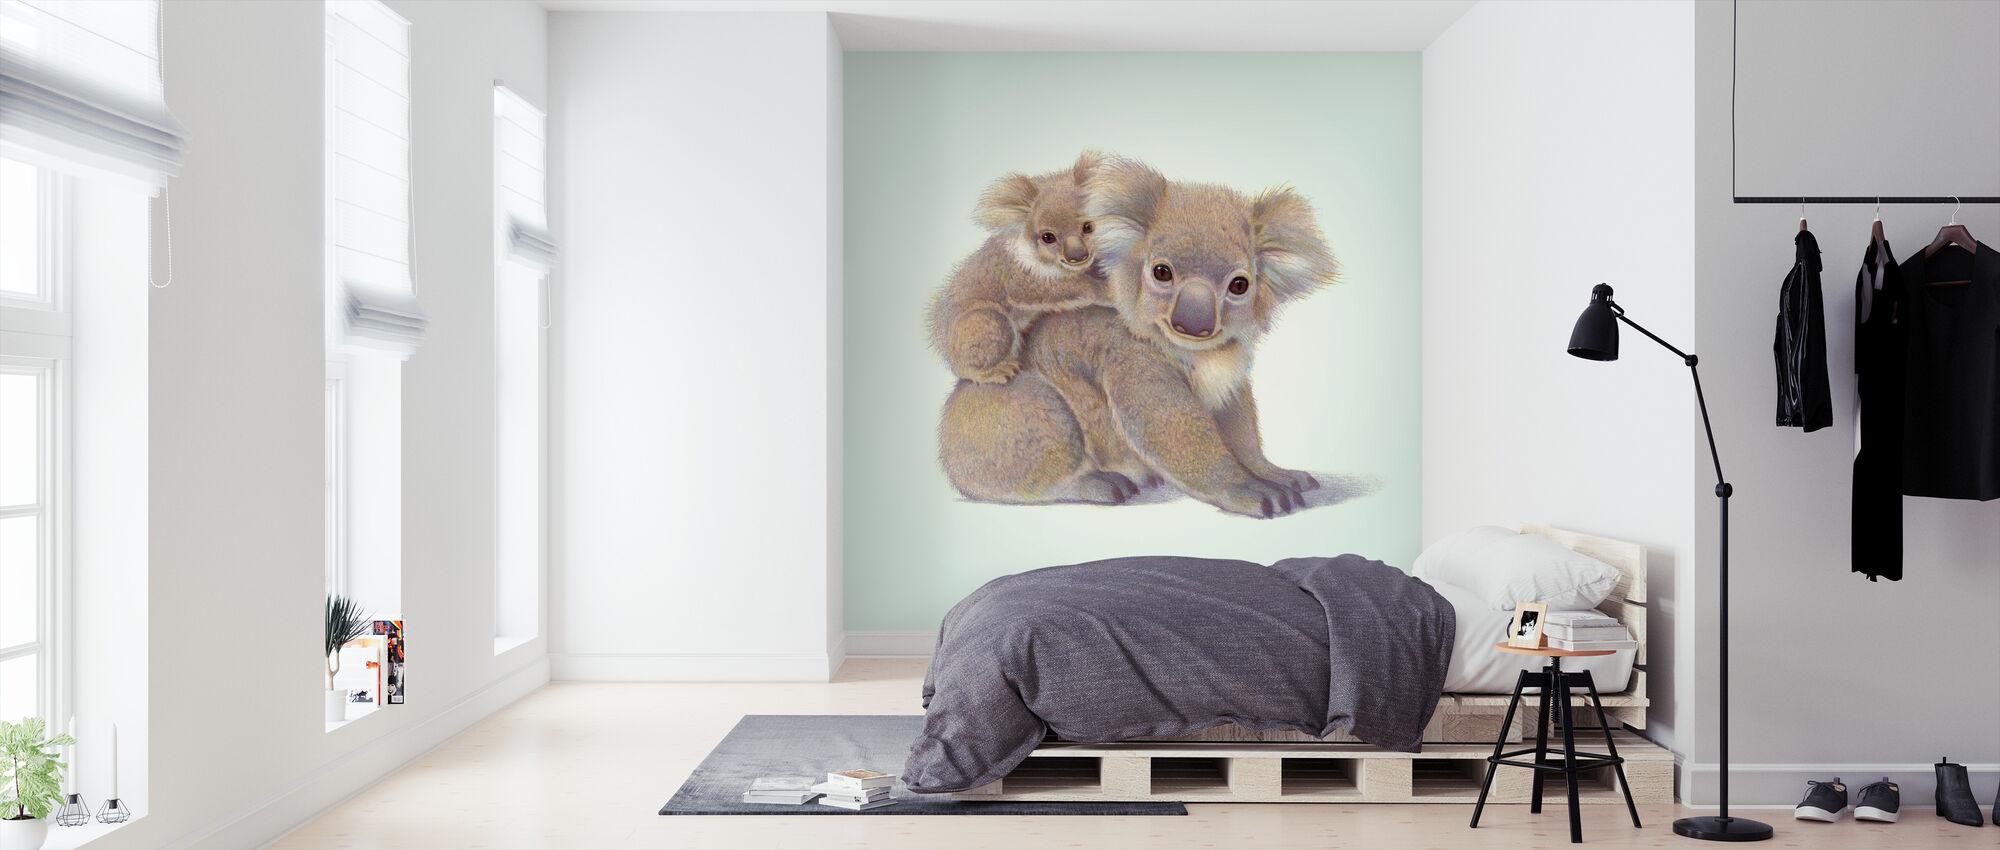 Koala Baby - Wallpaper - Bedroom